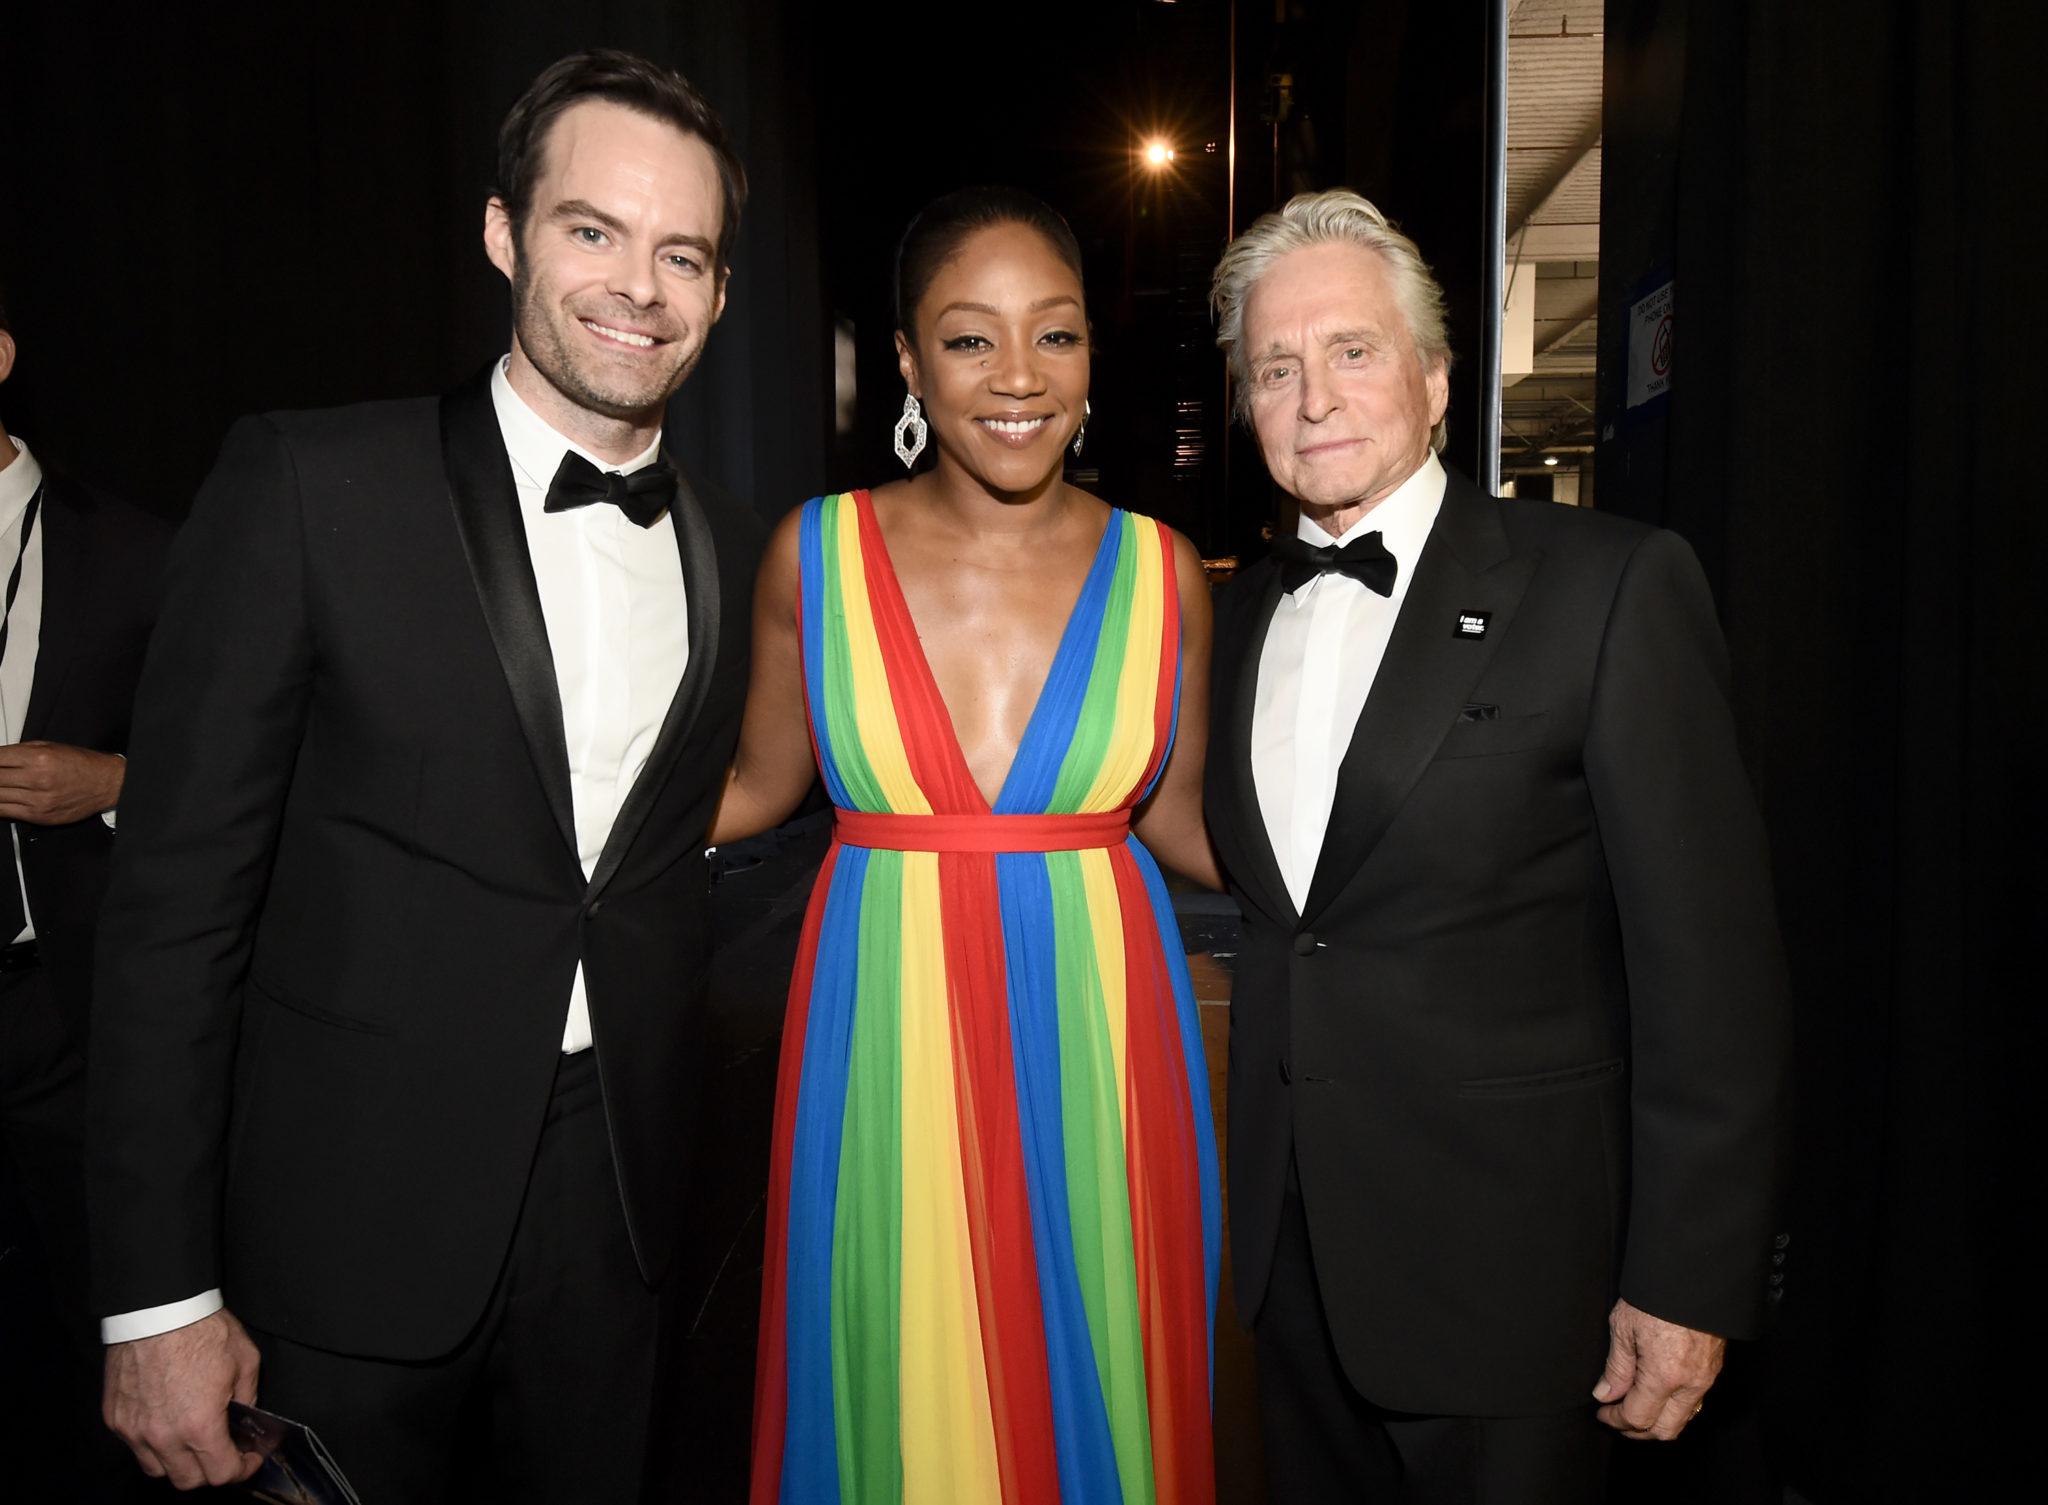 Bill Hader, Tiffany Haddish, Michael Douglas 4Chion Lifestyle Emmy